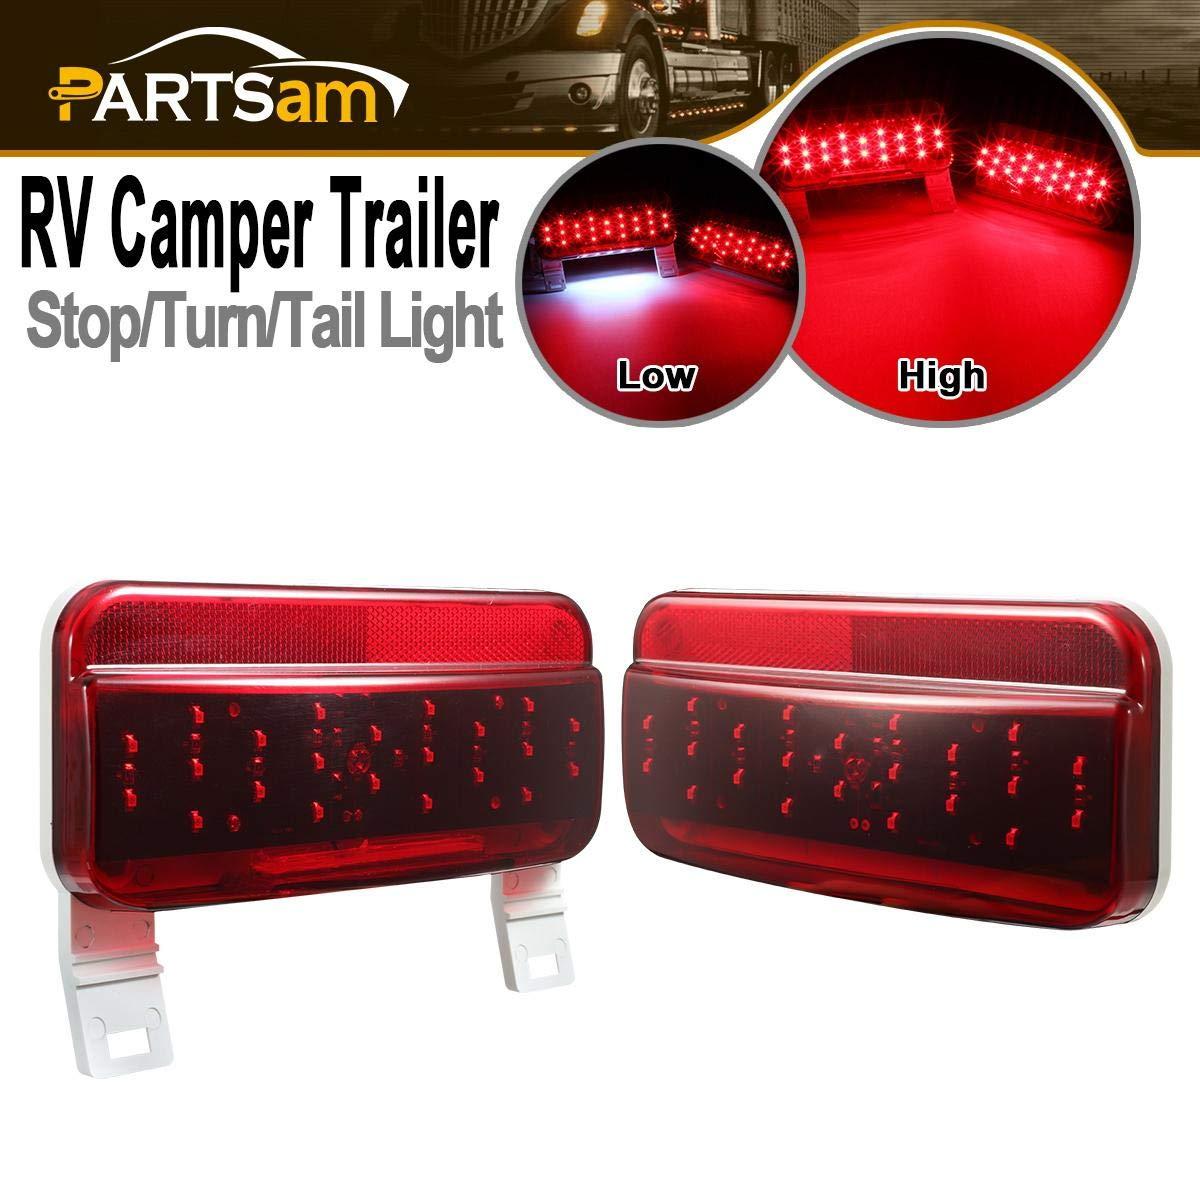 Partsam Rectangular Red LED RV Camper Trailer Stop Turn Brake Tail Lights White License Plate Light Kit 49 LED with White Base Waterproof 12V Sealed with Reflex Lens Surface Mount (Left + Right)